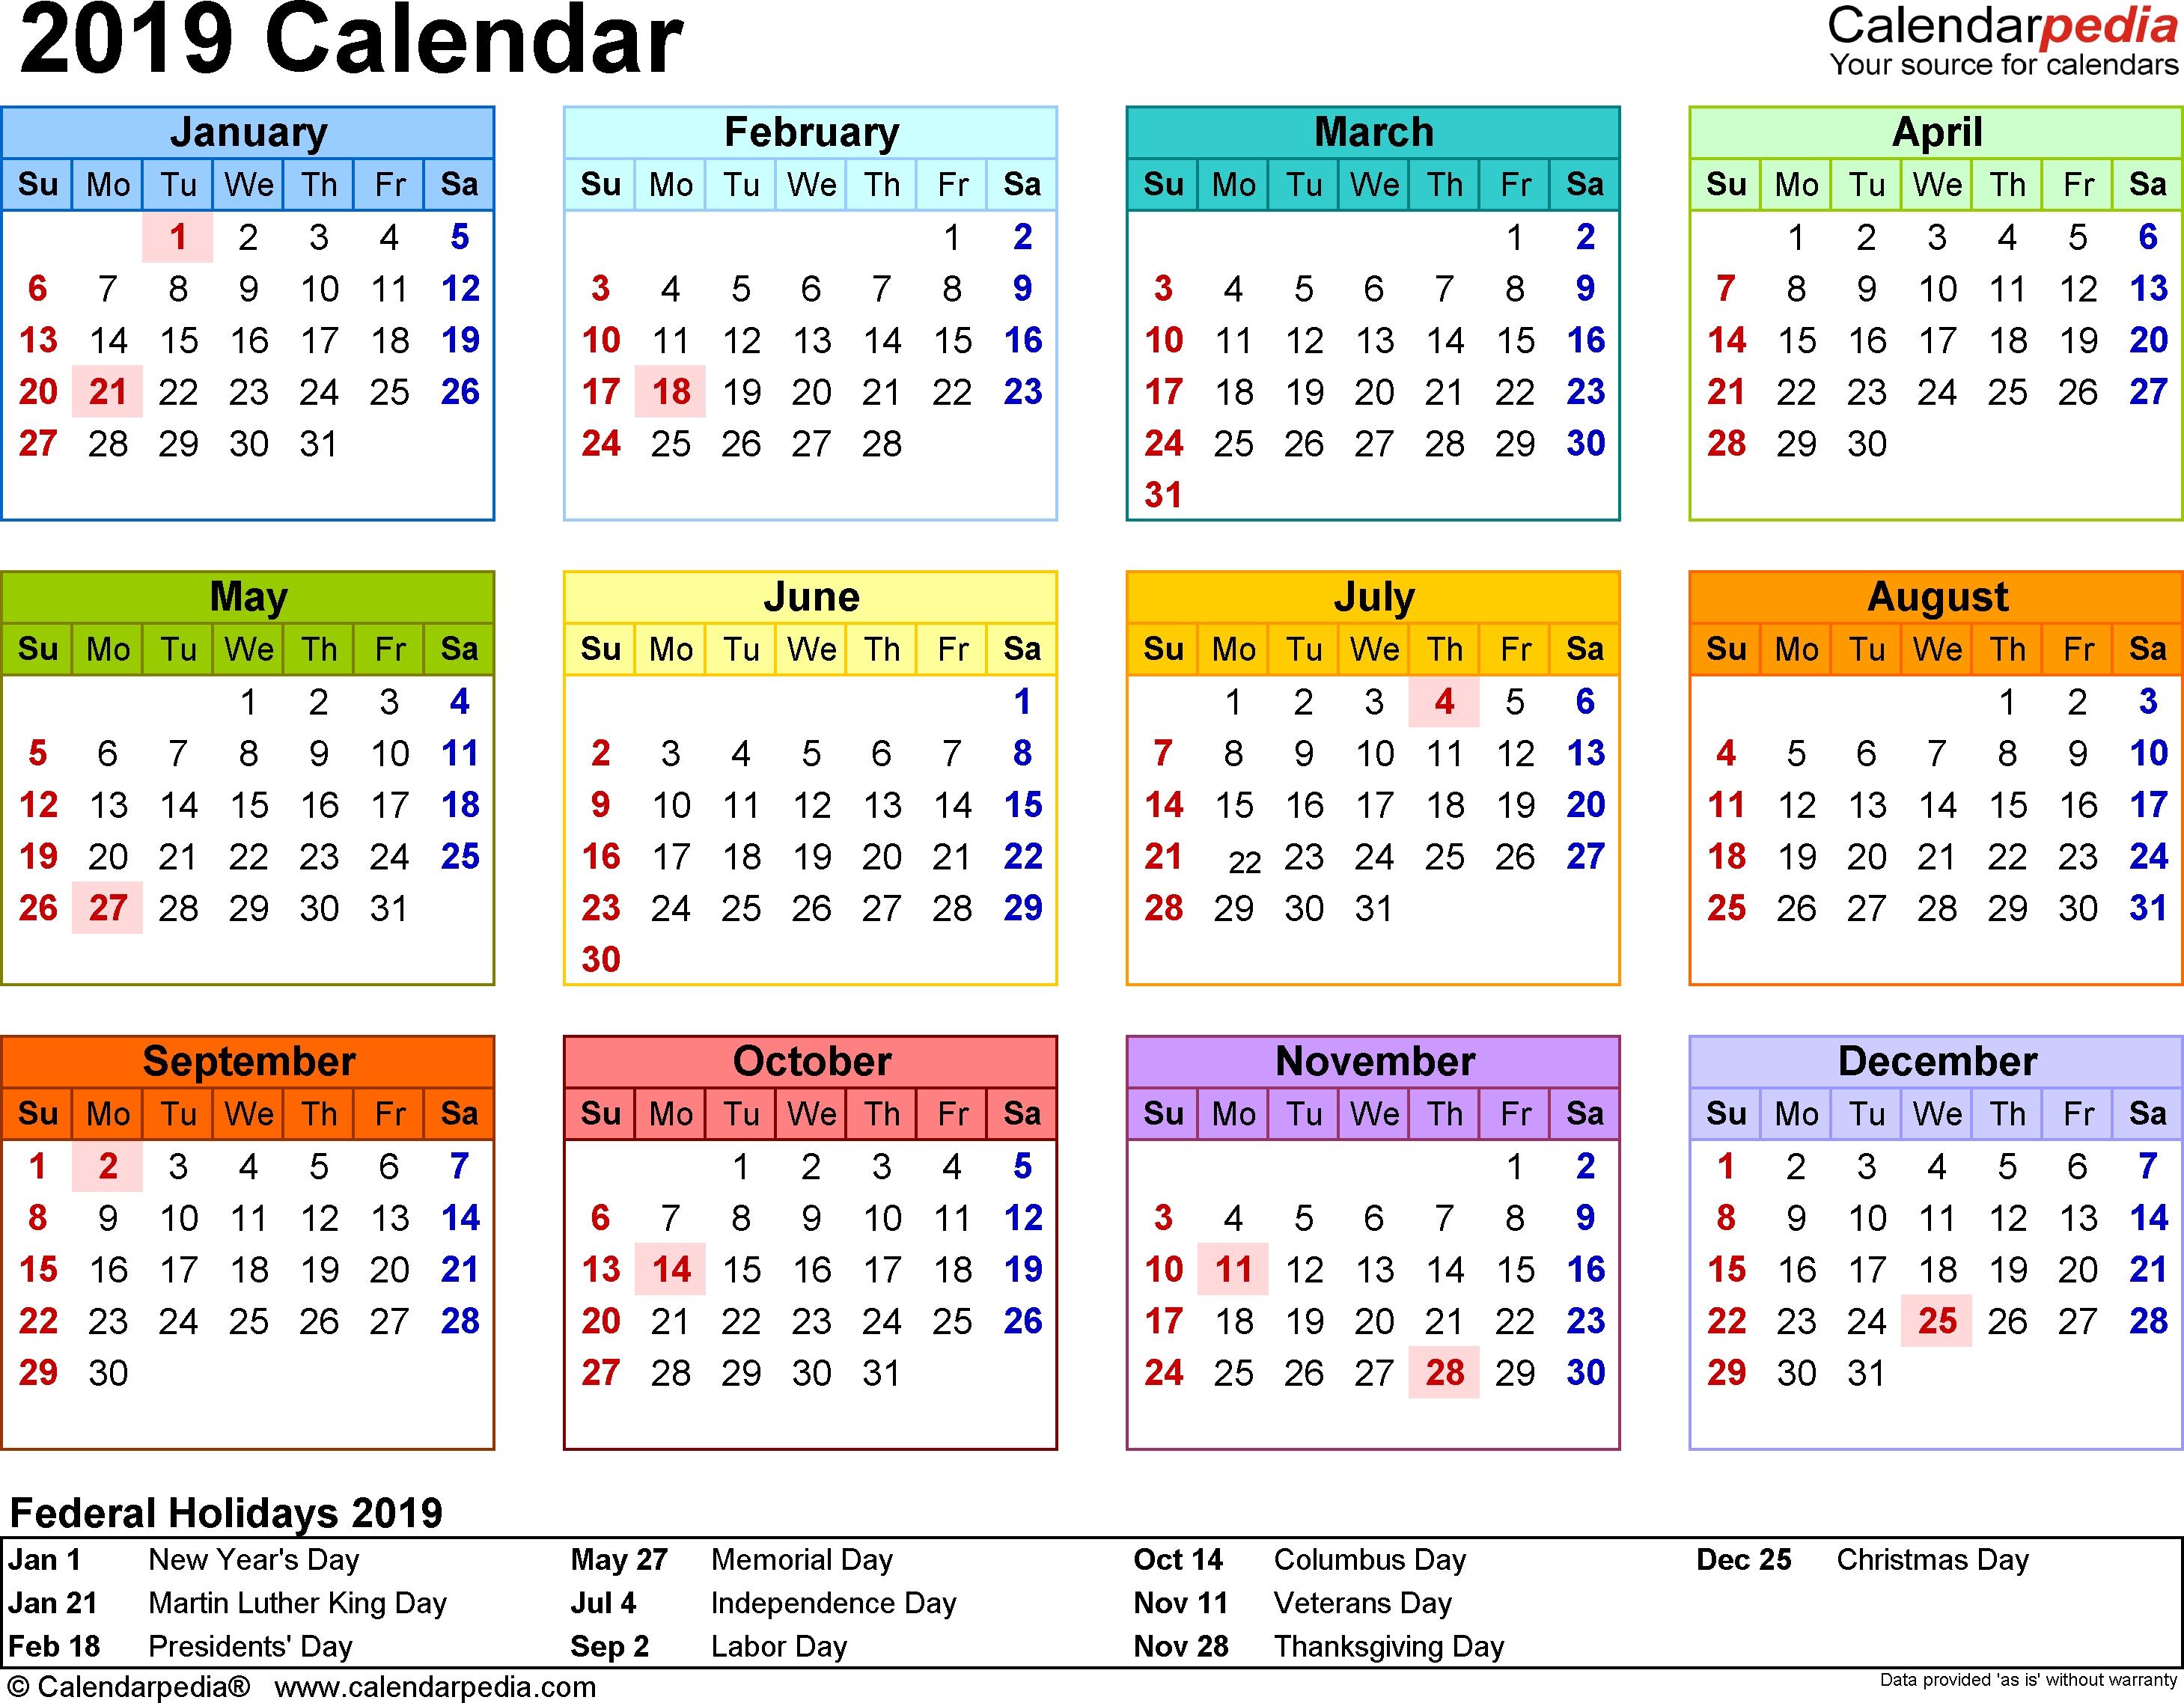 2019 Calendar - Free Printable Templates in Free Printable Pocket Size Calendars 2019-2020